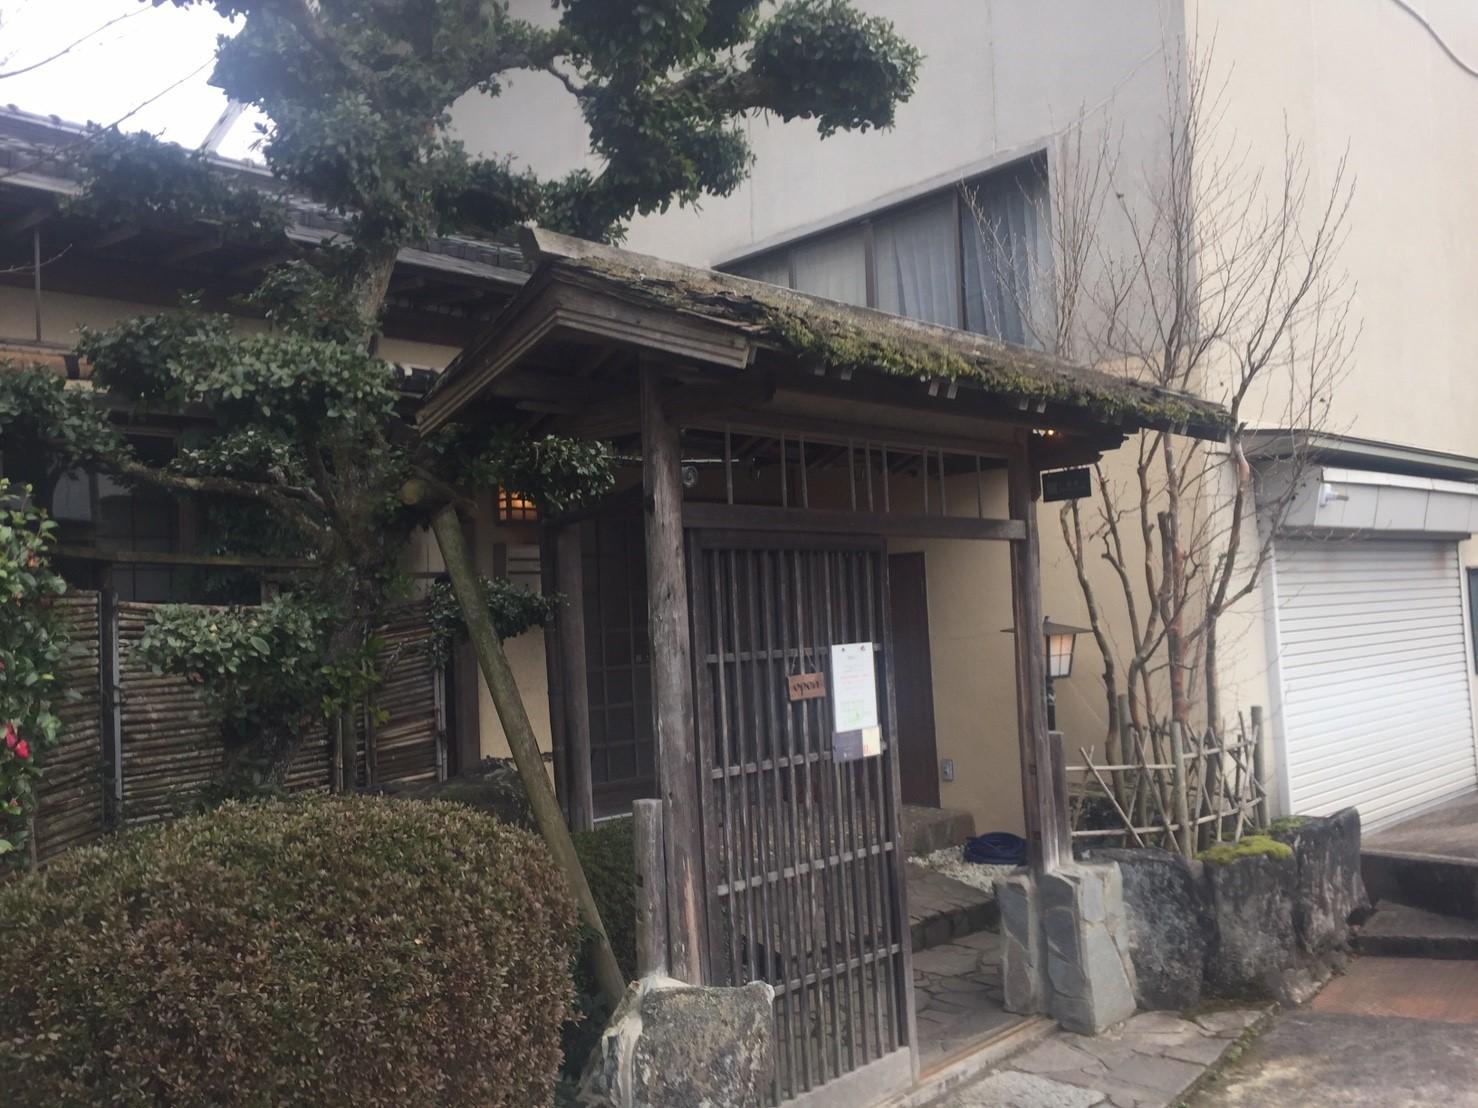 kitchin & cafe 葵屋_e0115904_04090703.jpg